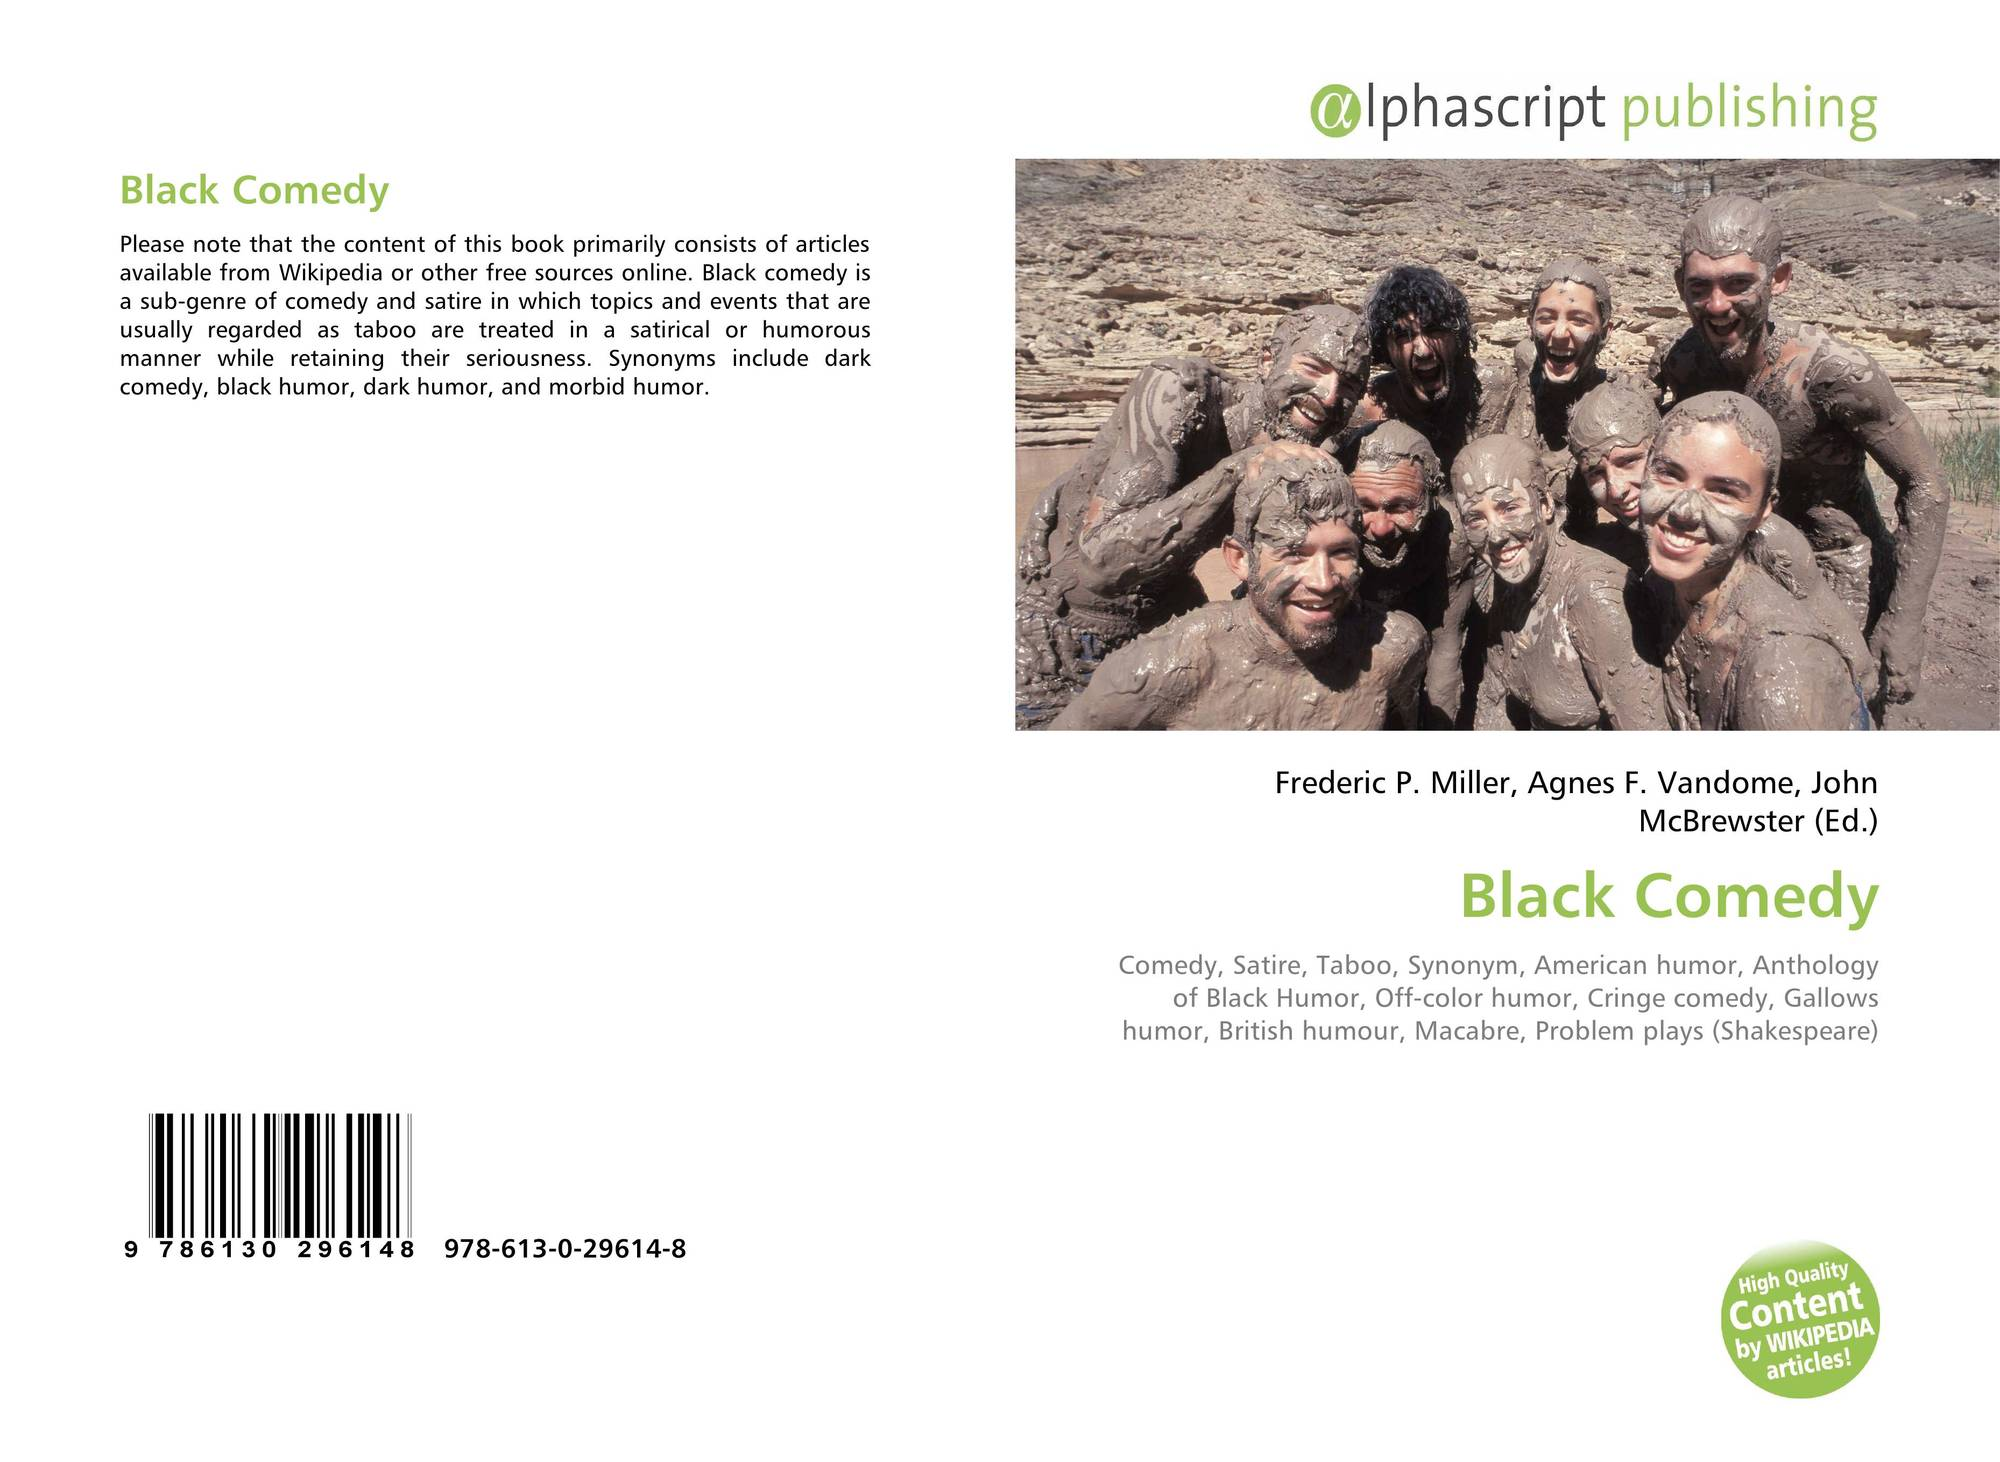 Black Comedy 978 613 0 29614 8 6130296142 9786130296148